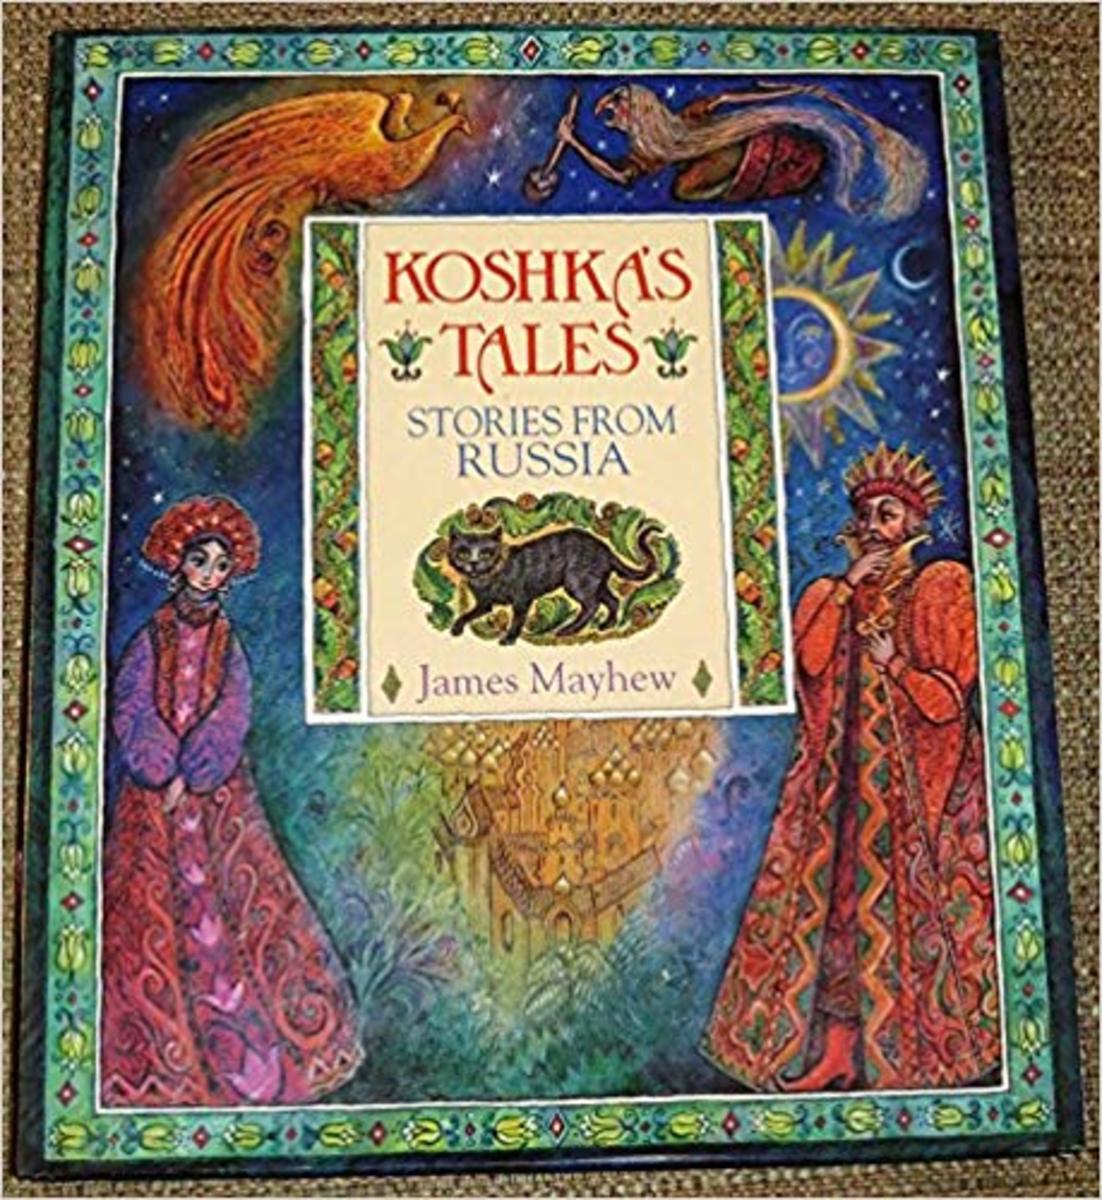 Koshka's Tales: Stories from Russia by James Mayhew